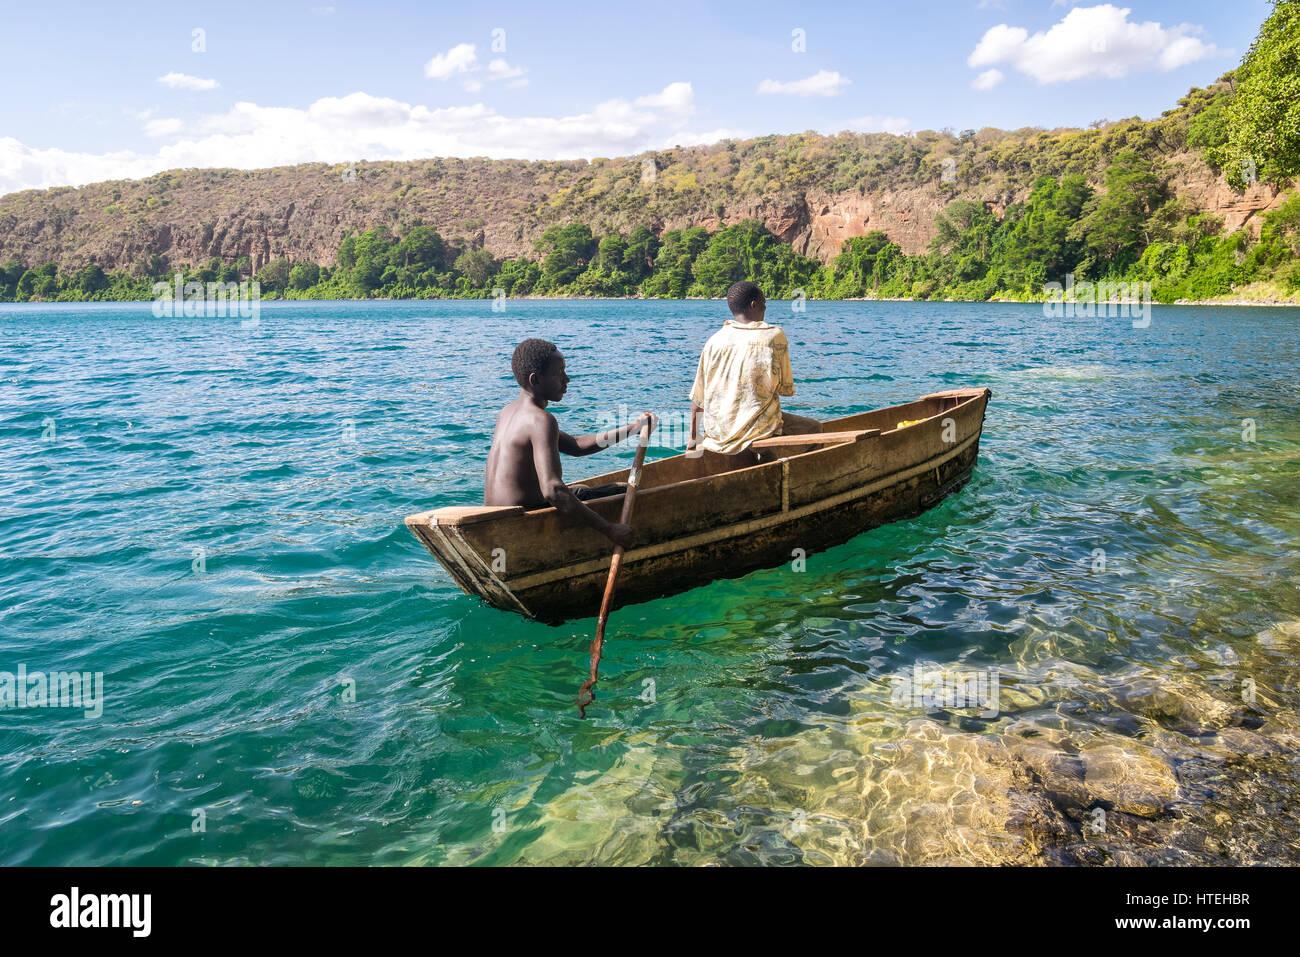 Africans in canoe, Chala lake, border Kenya and Tanzania - Stock Image